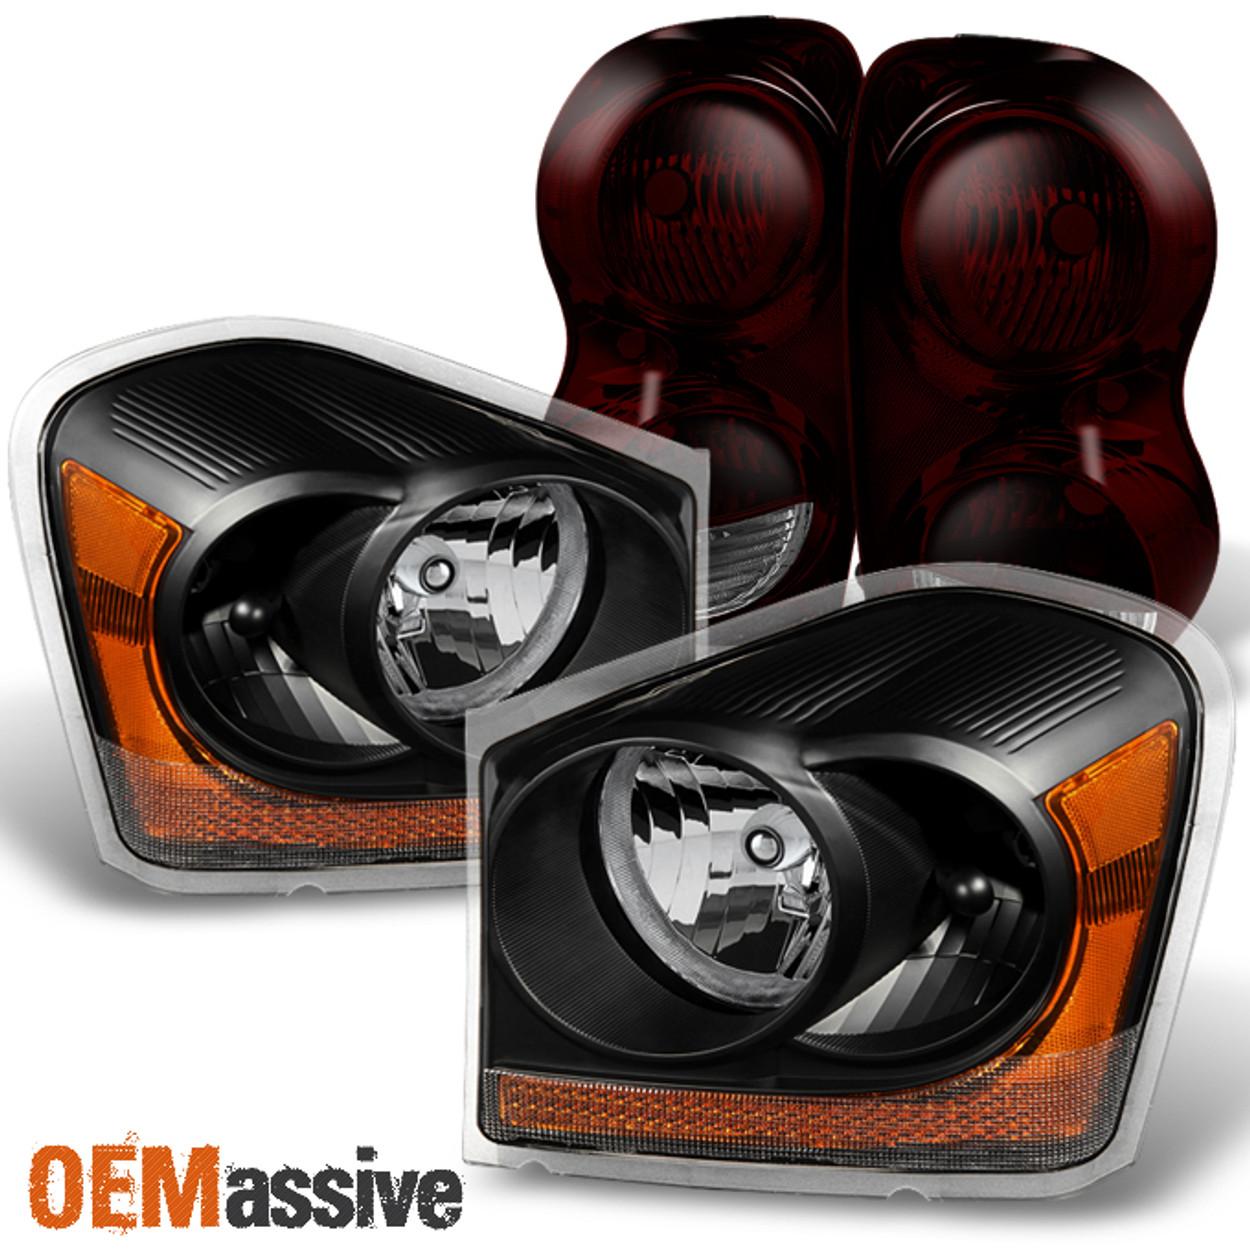 Fit 04 06 Dodge Durango Black Headlights Dark Red Tail Lights Replacement Oemassive